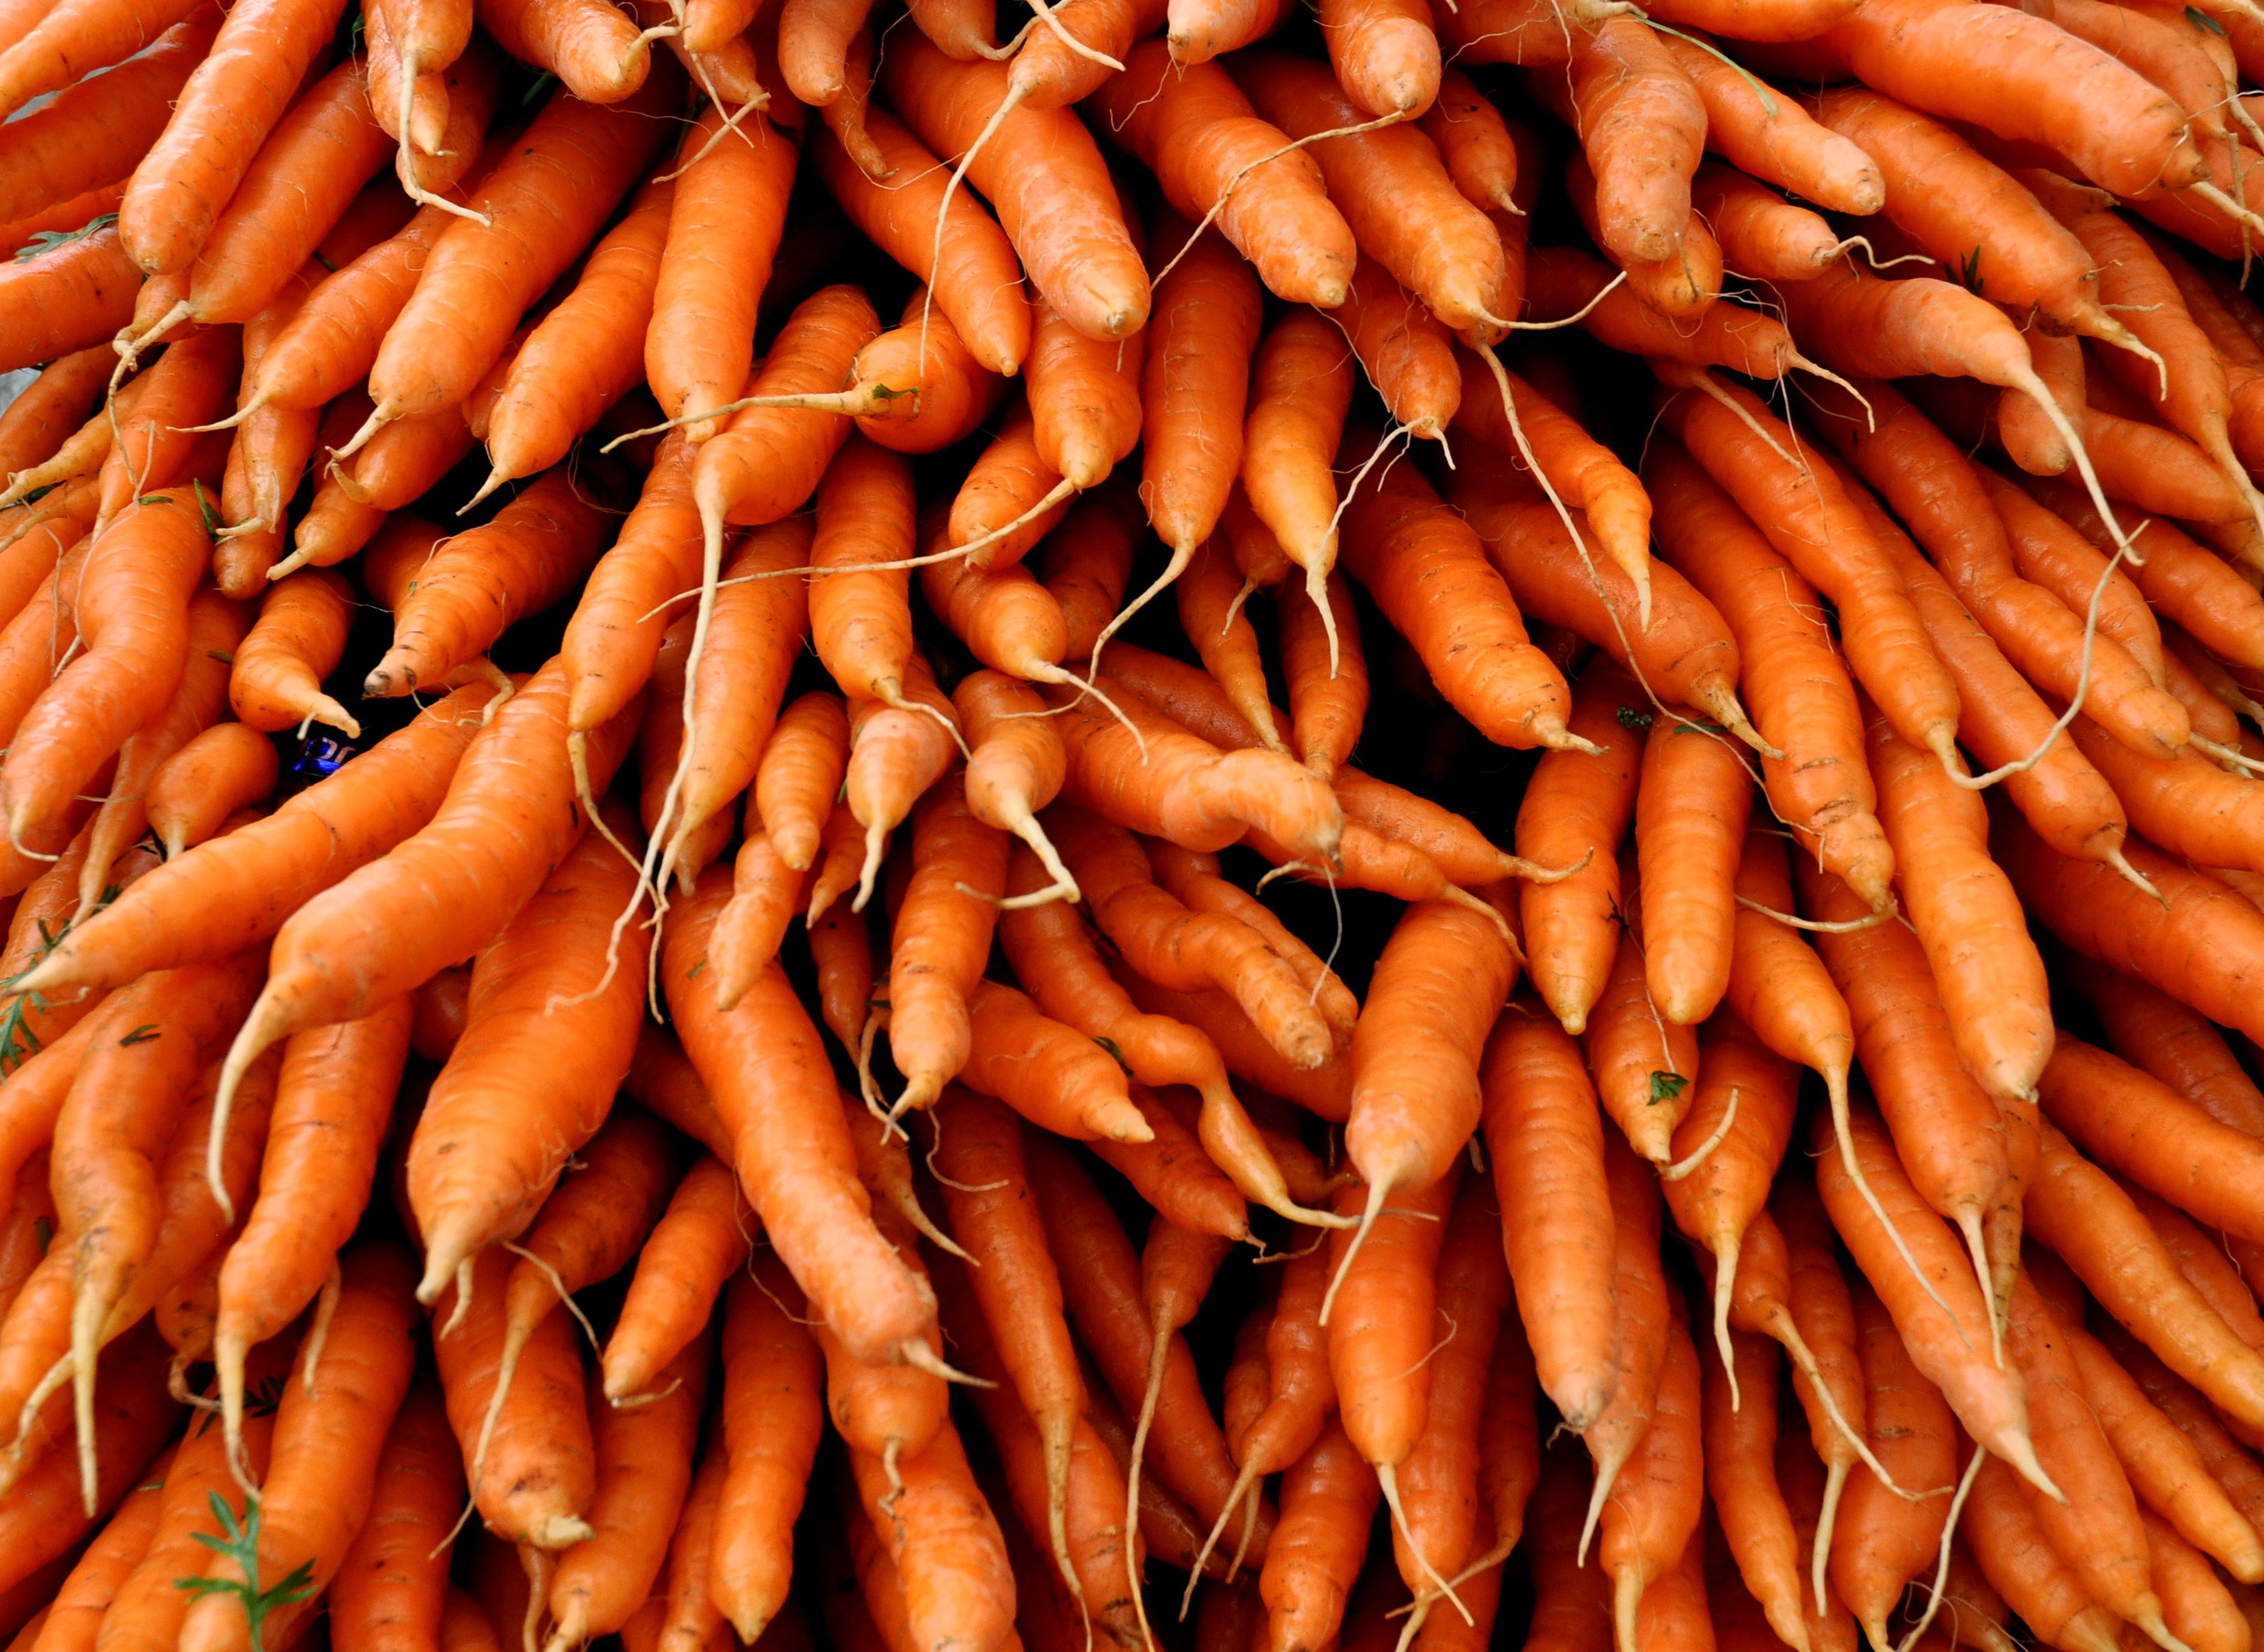 Carrots from Boistfort Valley Farm. Photo copyright 2012 by Zachary D. Lyons.